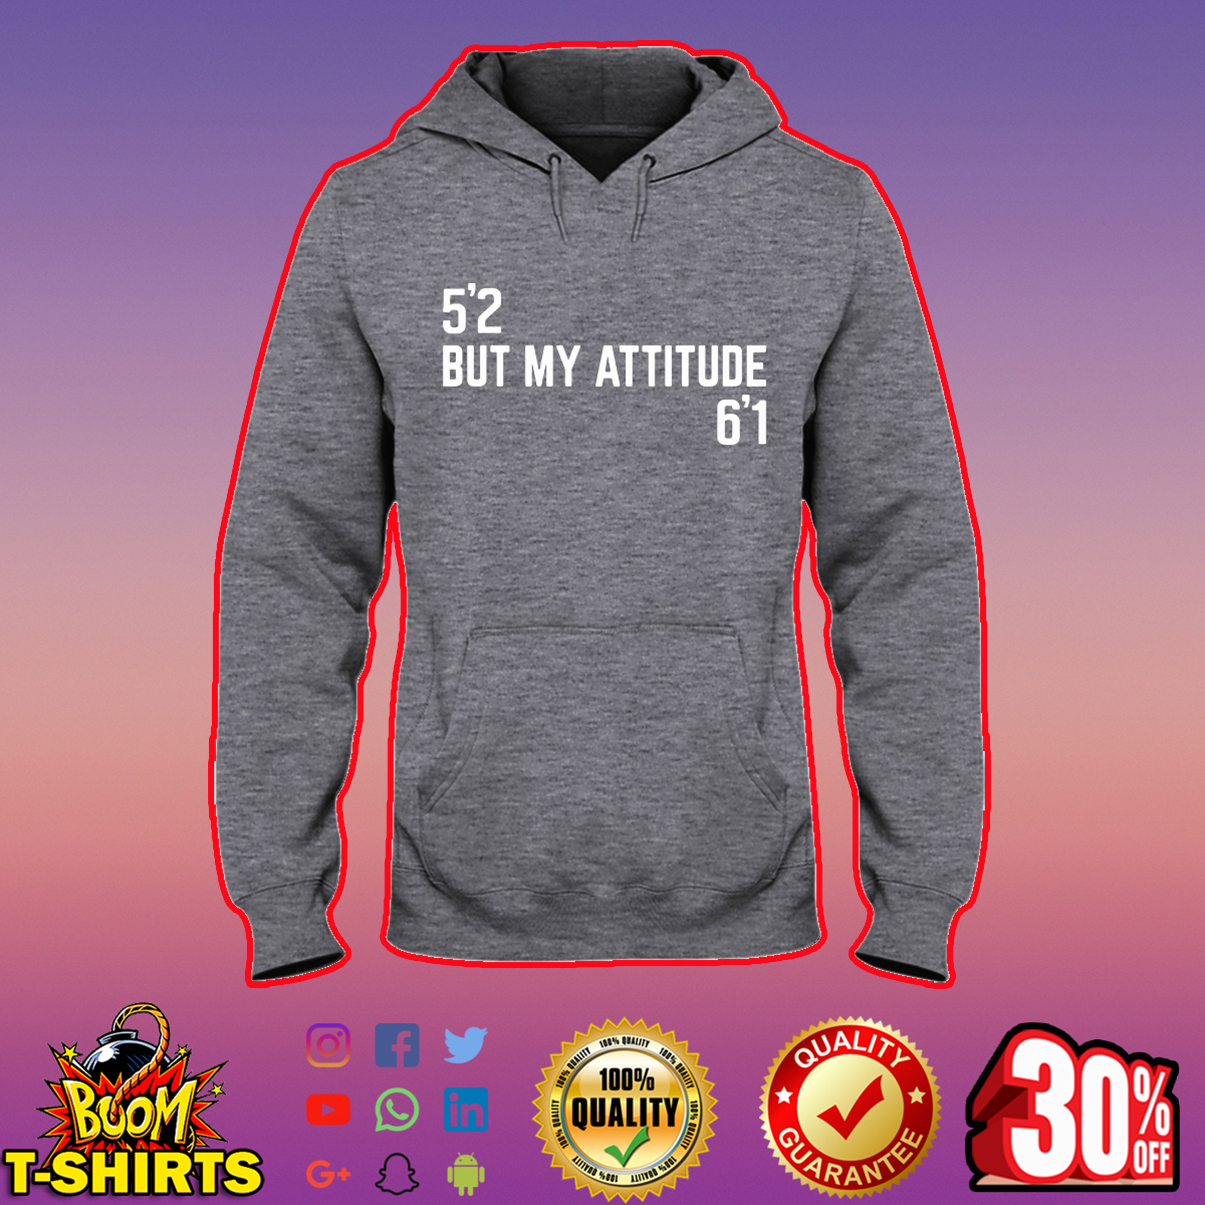 5'2 but my attitude 6'1 hooded sweatshirt